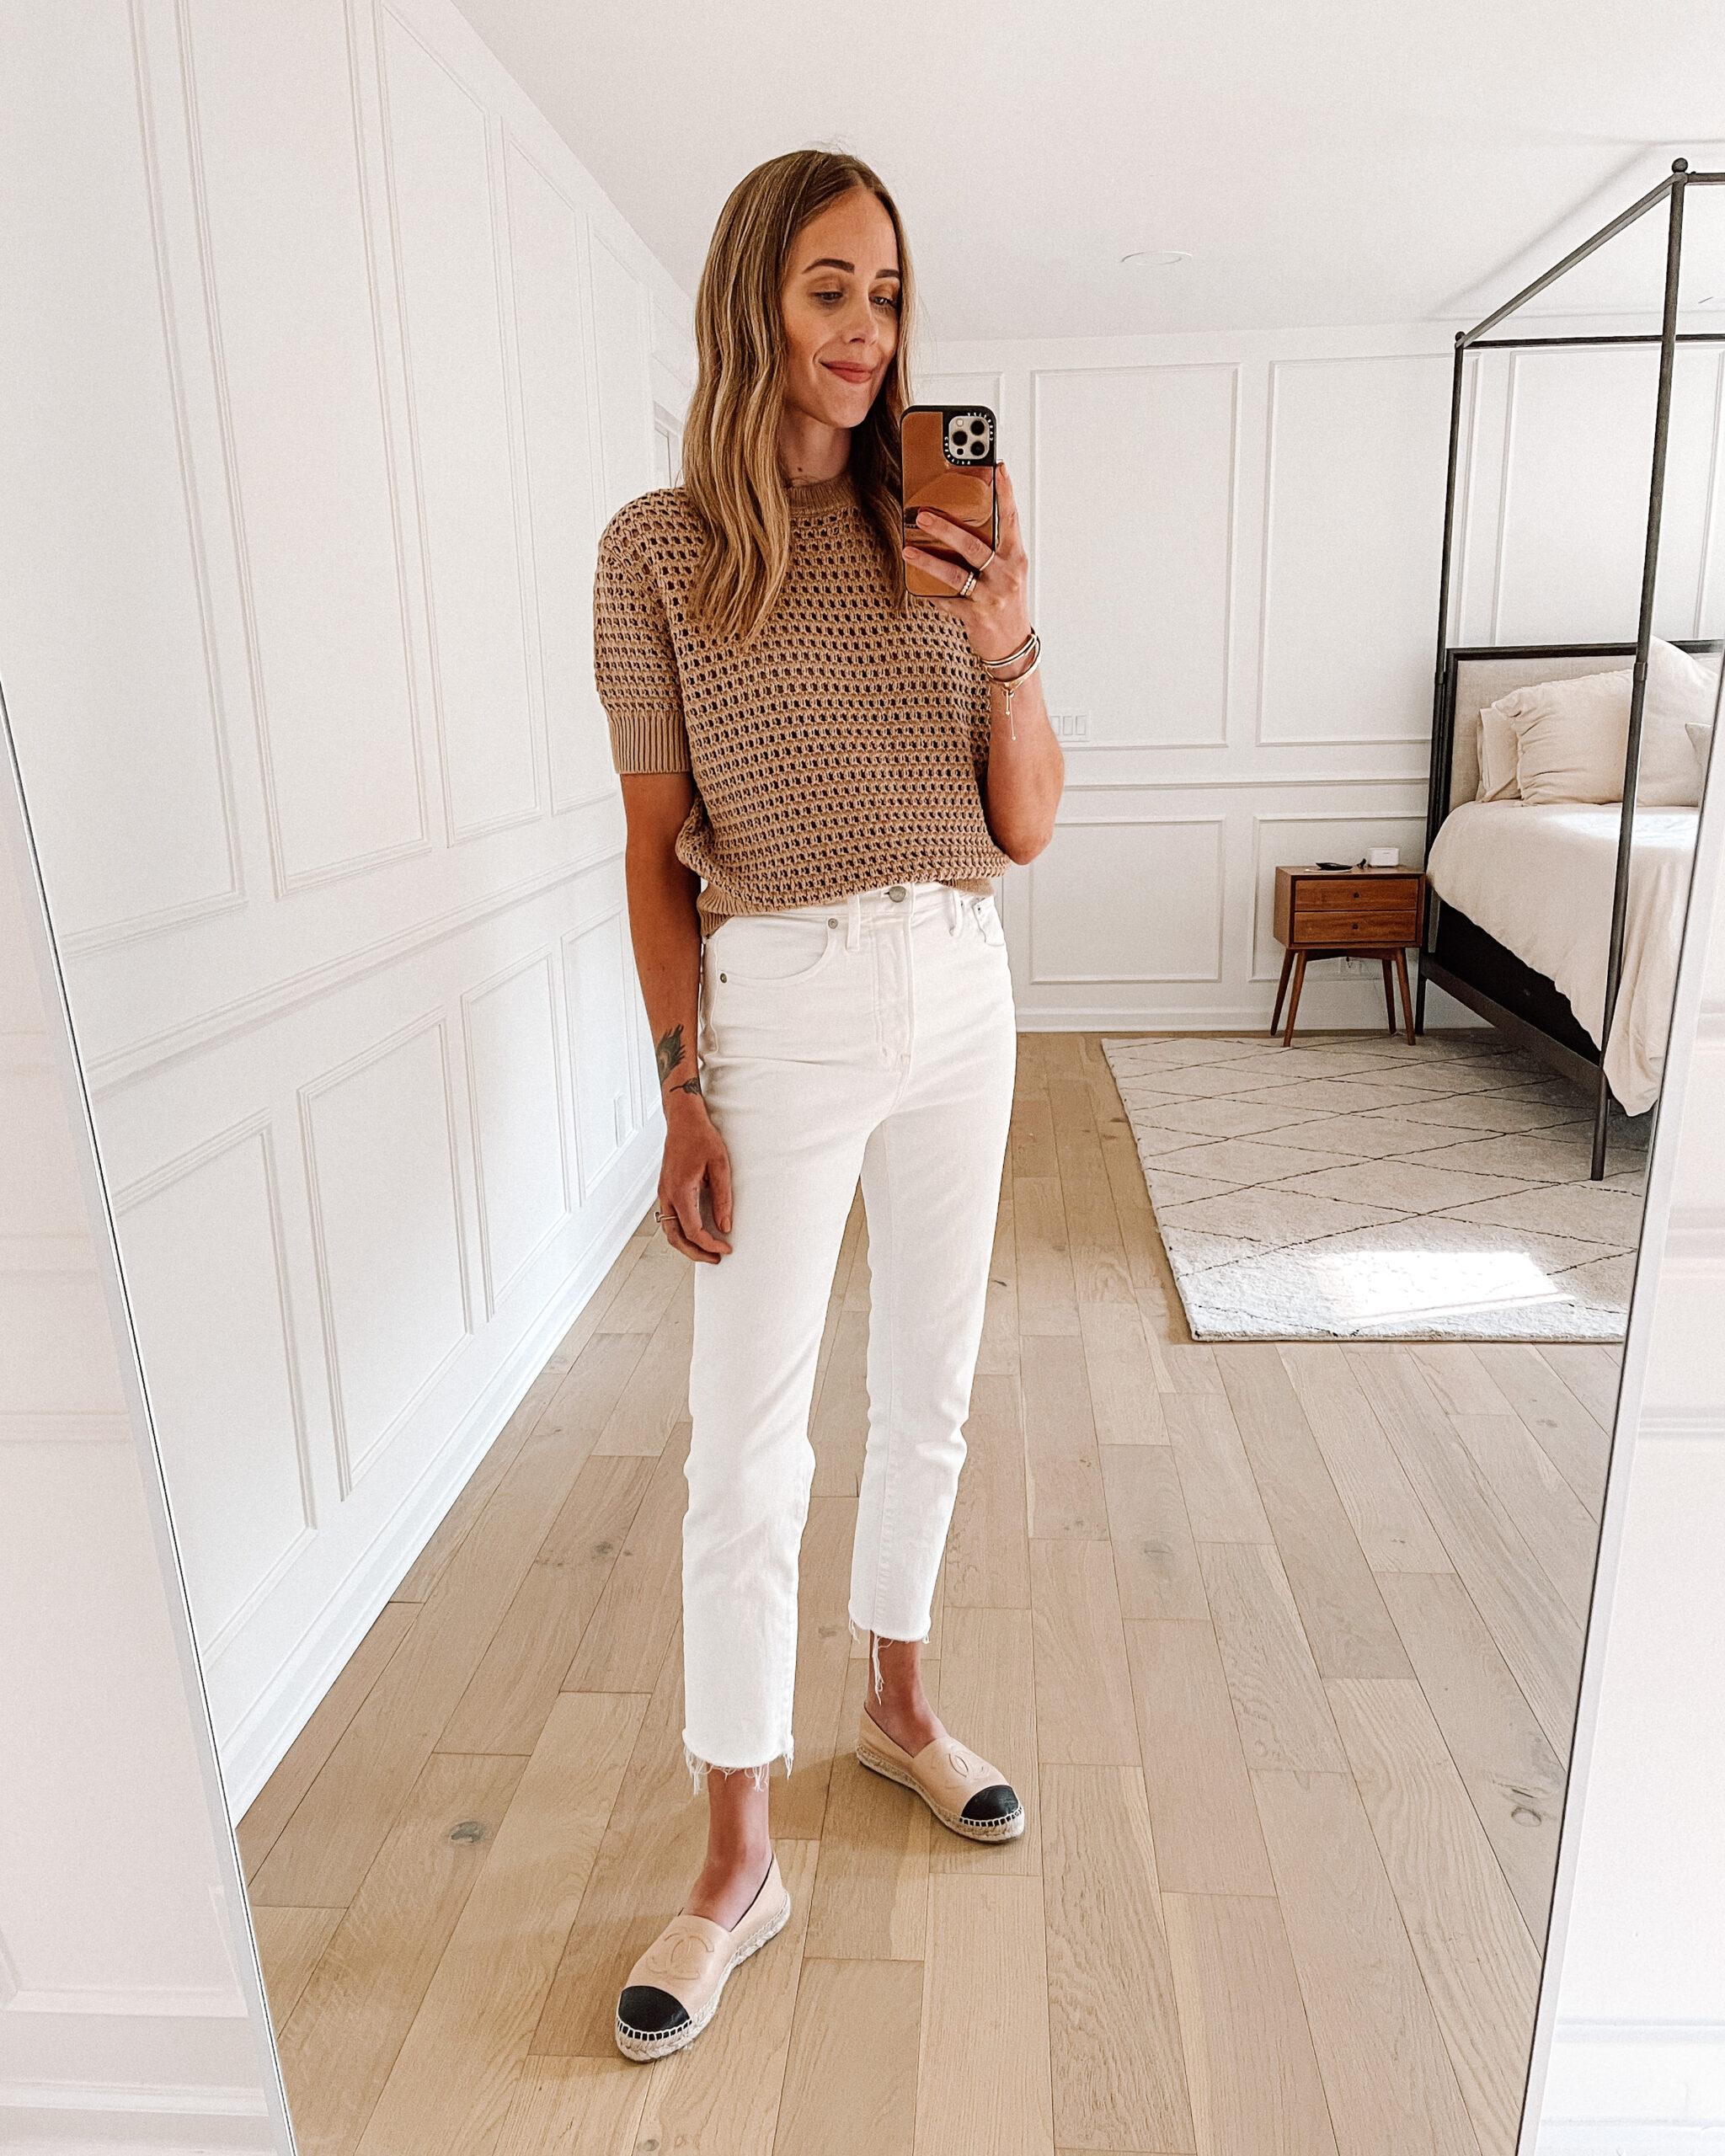 Fashion Jackson Wearing Beige Tan Knit Short Sleeve Sweater White Raw Hem Jeans Chanel Espadrilles